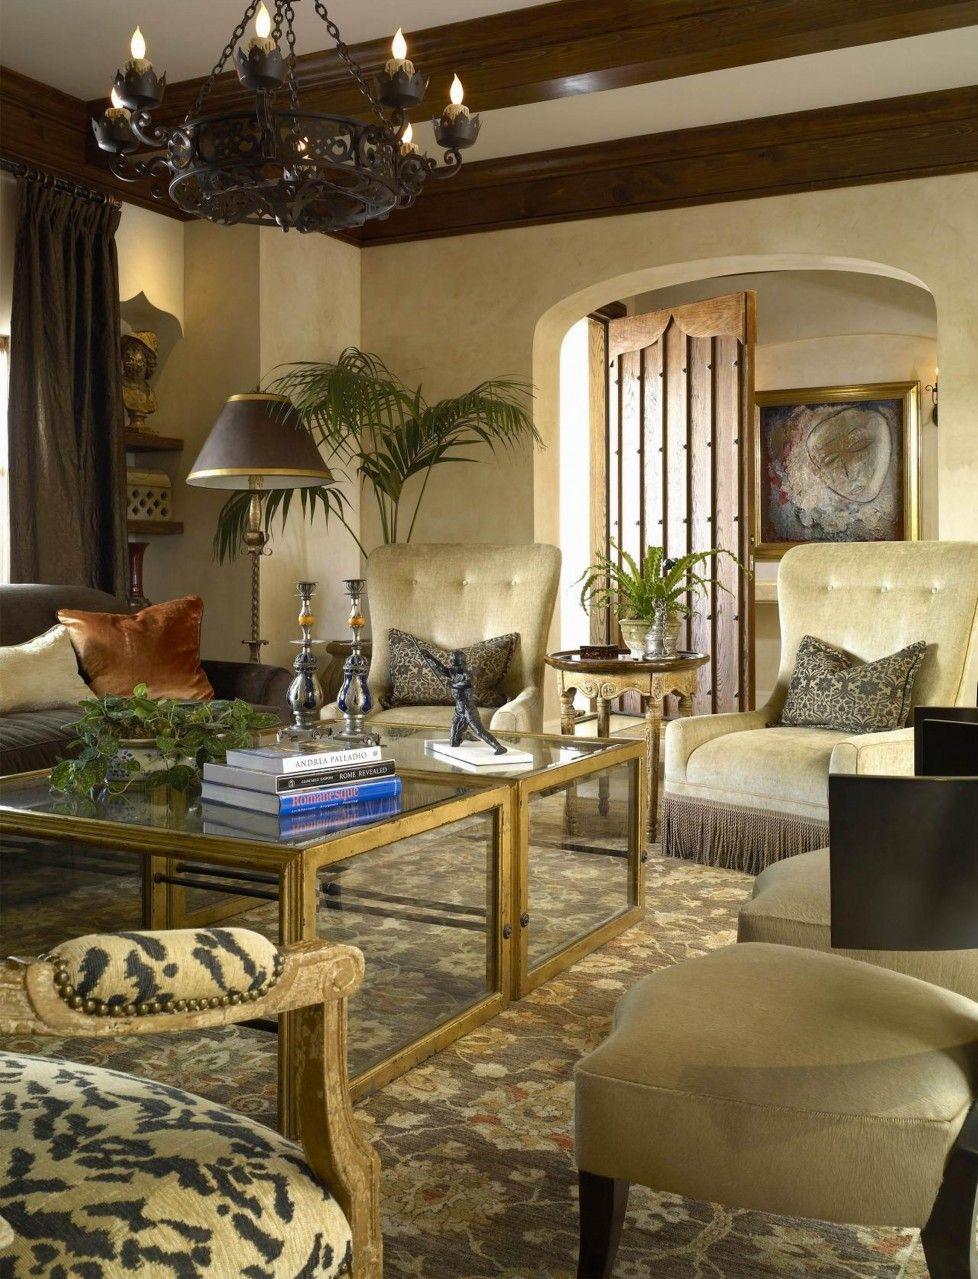 Download designer modern tuscan living room with old world style download designer modern tuscan living room with old world style living room chandelier floor lamp tuscany arubaitofo Images